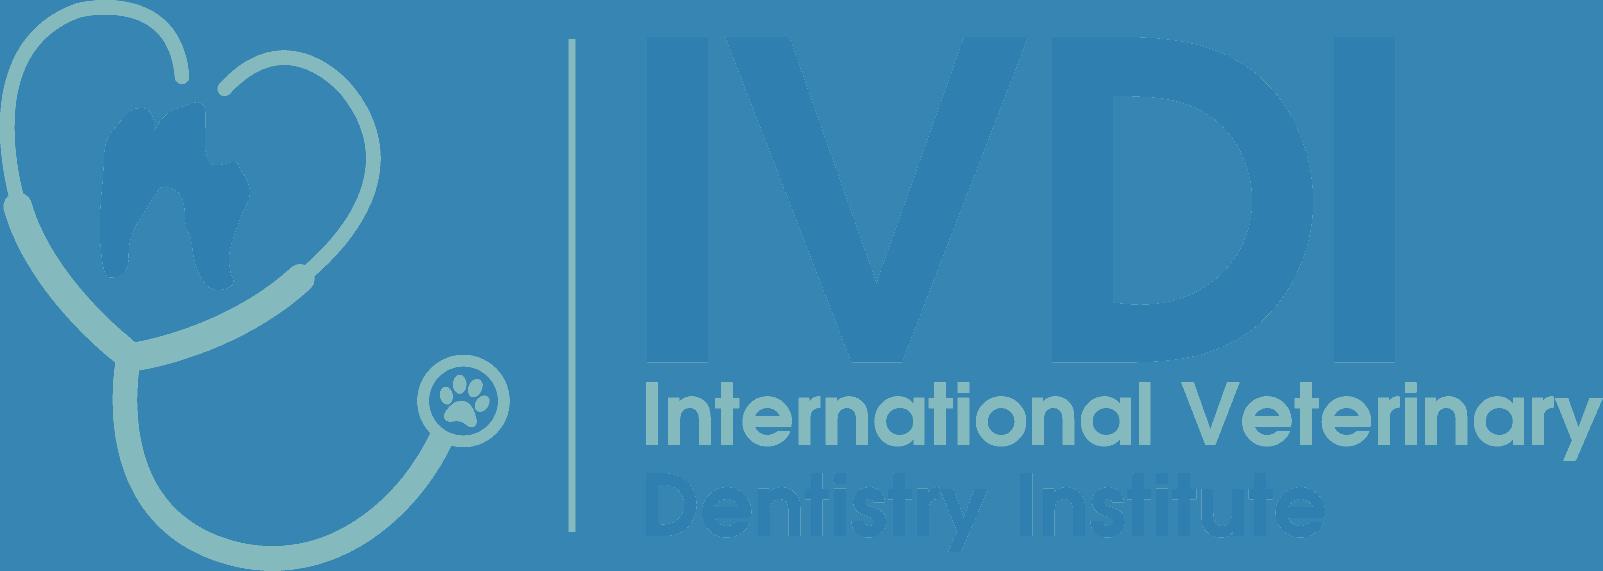 The Logo of the International Veterinary Dentistry Institute